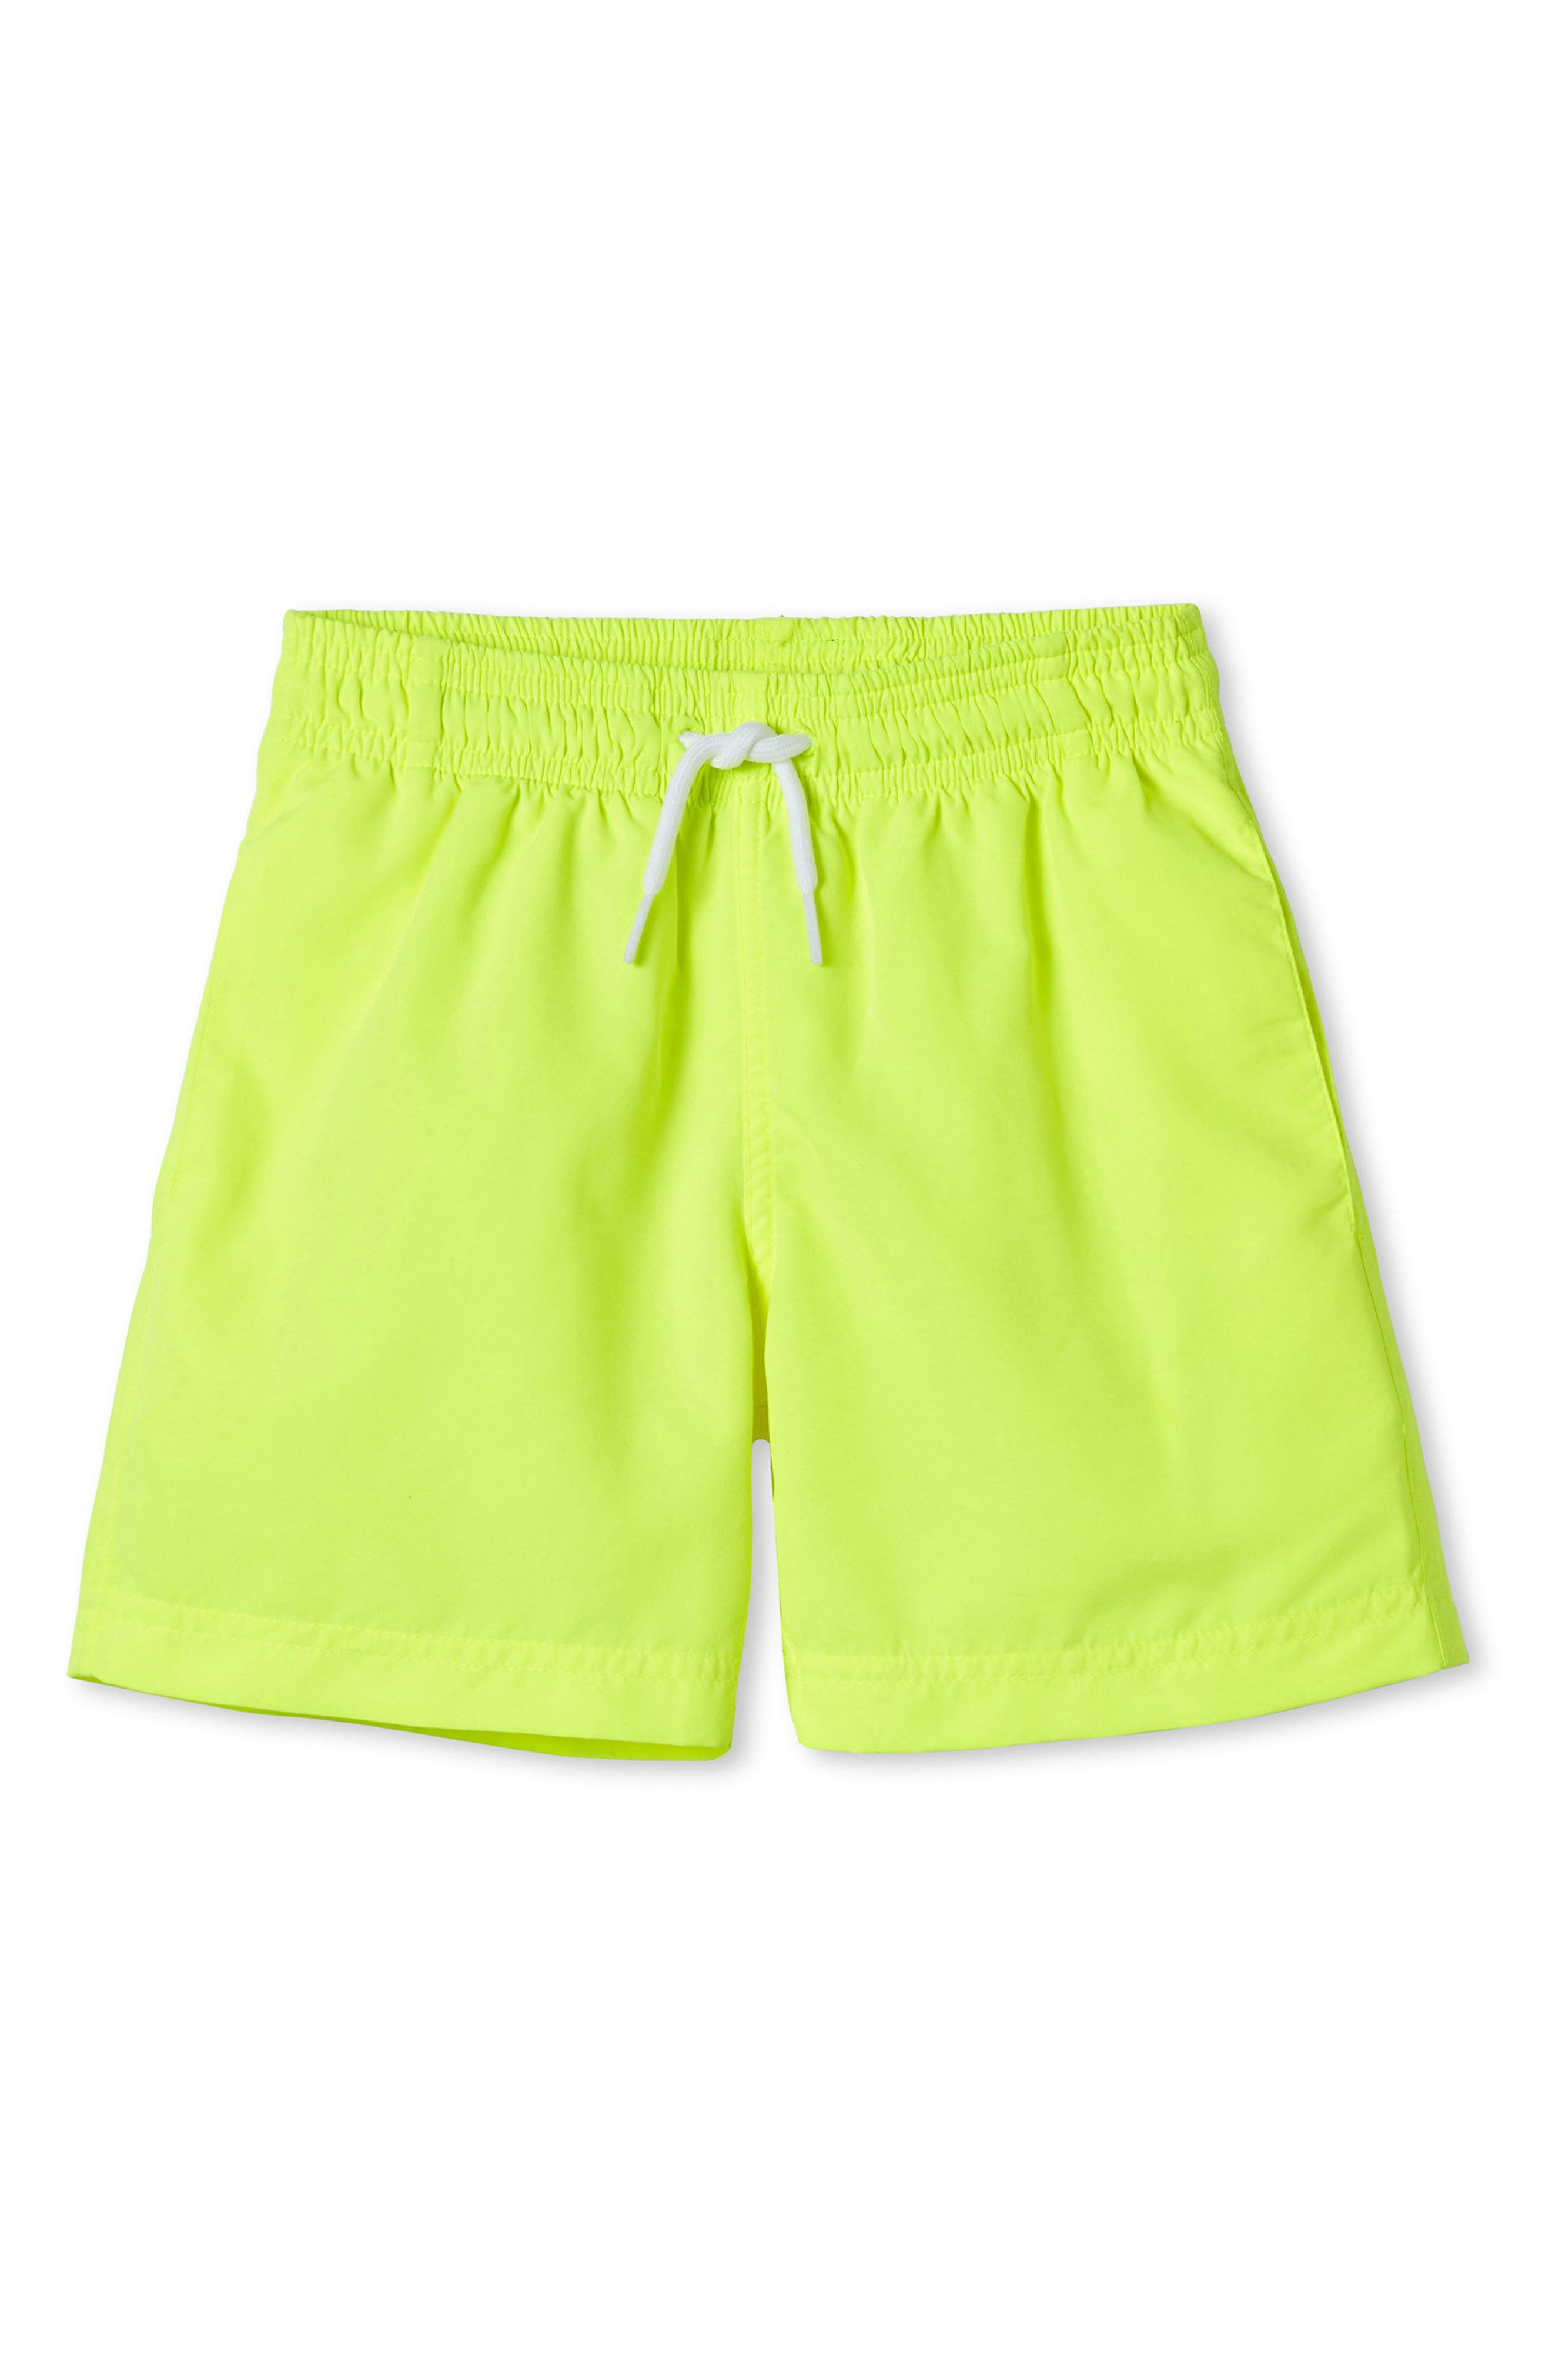 Neon Yellow Swim Trunks,                         Main,                         color, Neon Yellow